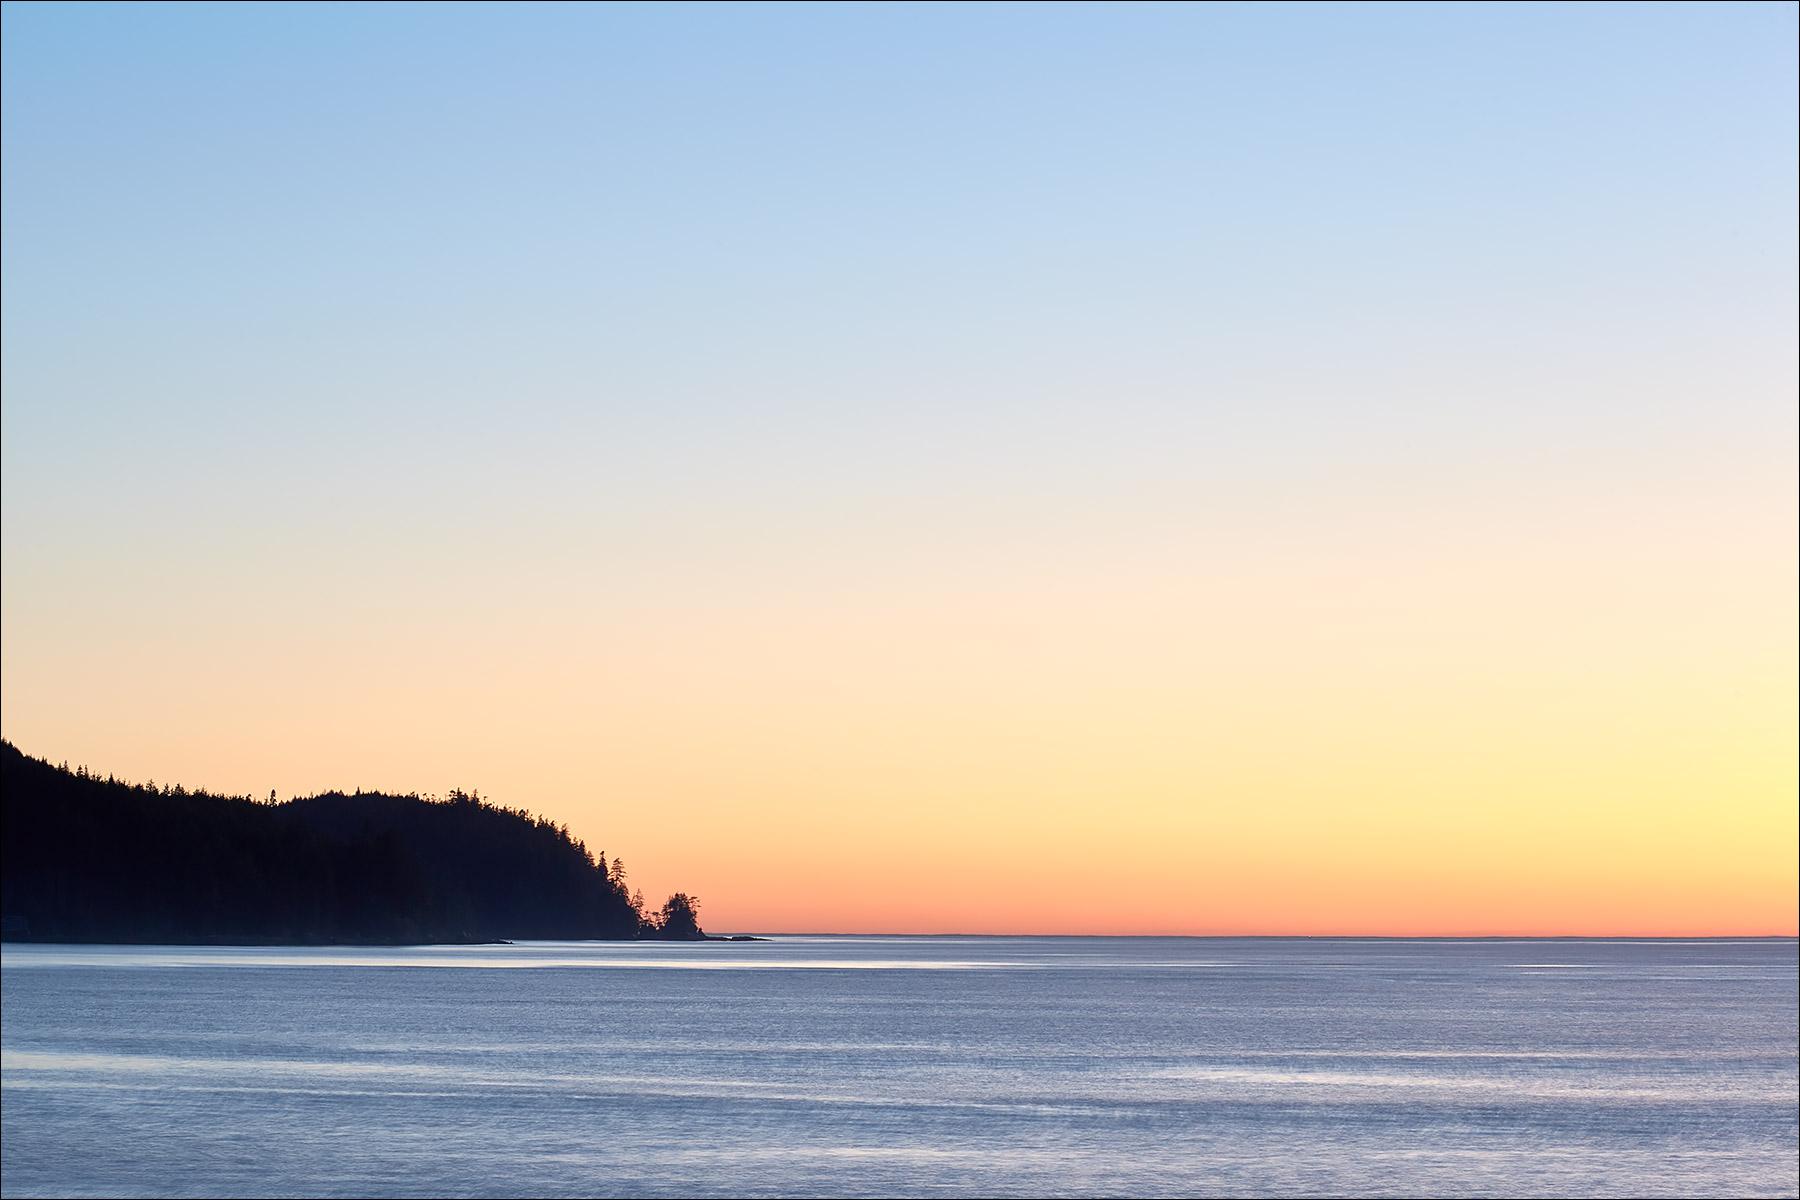 Port Renfrew Photos ©johncameron.ca